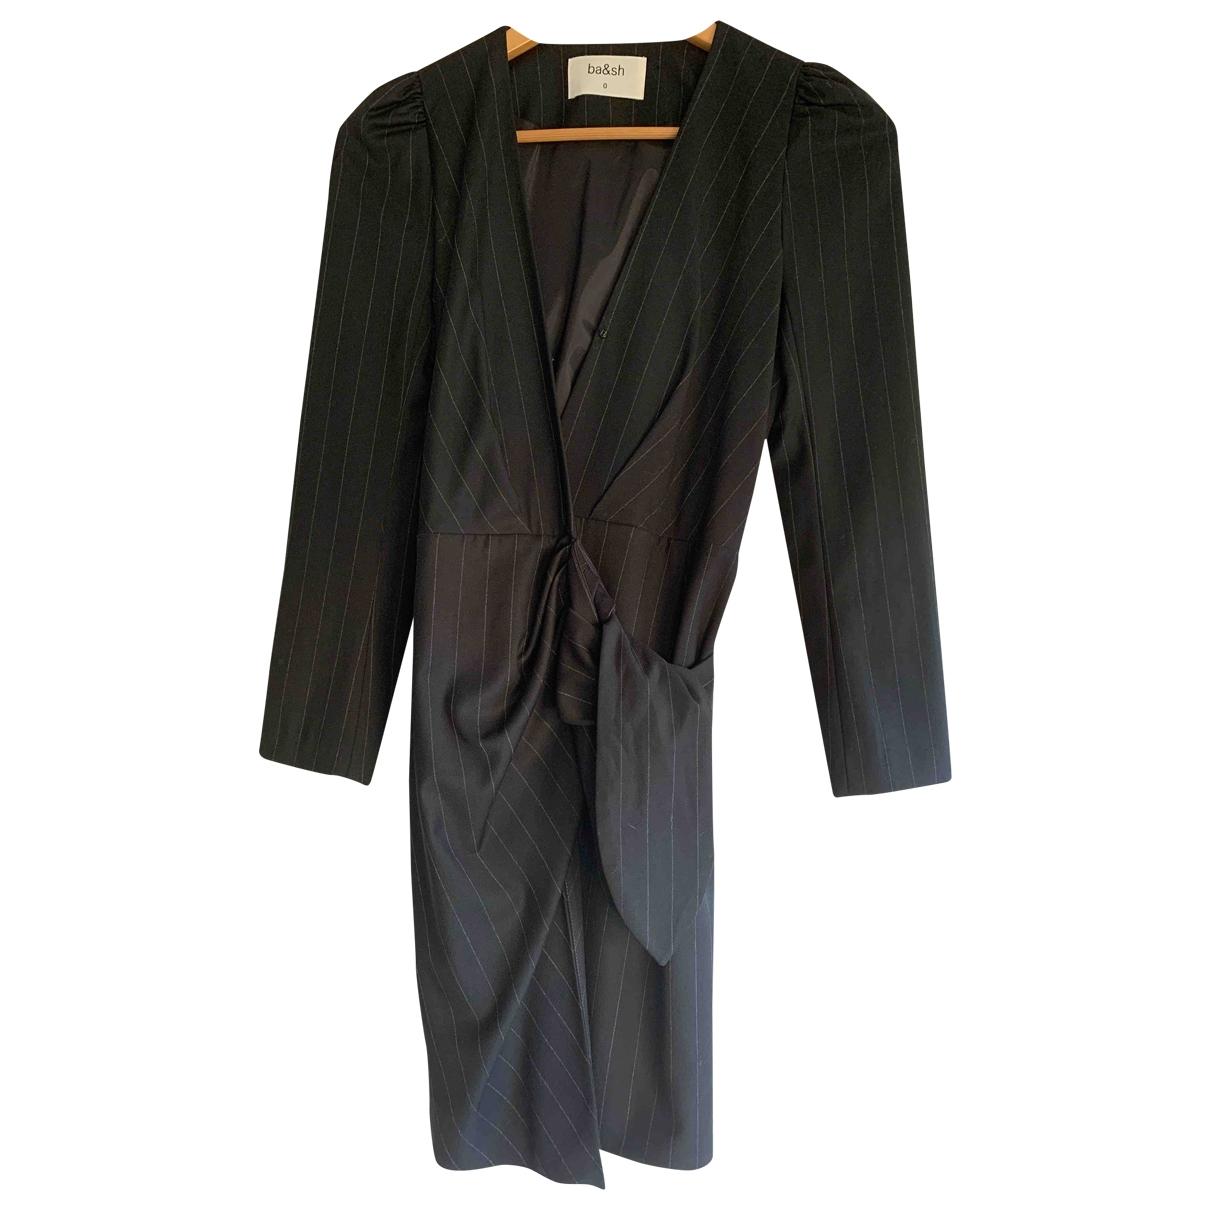 Ba&sh Fall Winter 2019 Anthracite dress for Women 36 FR